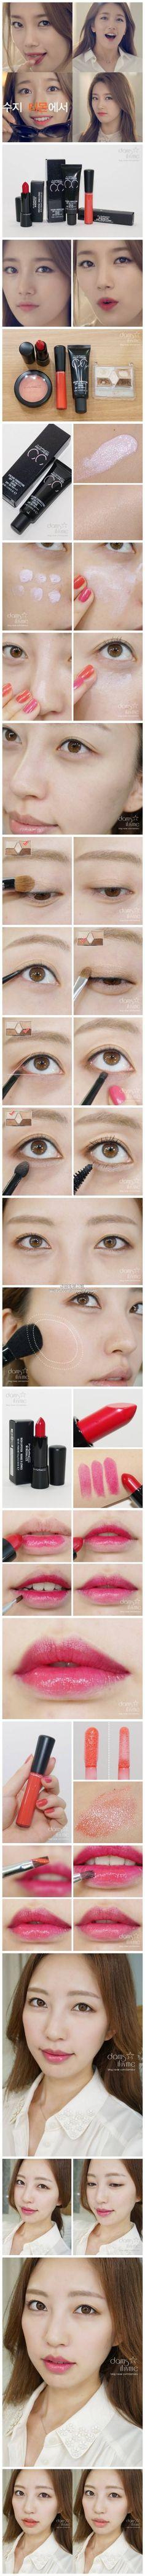 Korean make up | ⭐️⭐ #JoinNerium #DebbieKrug #NeriumKorea ️ www.AsianSkincare.Rocks